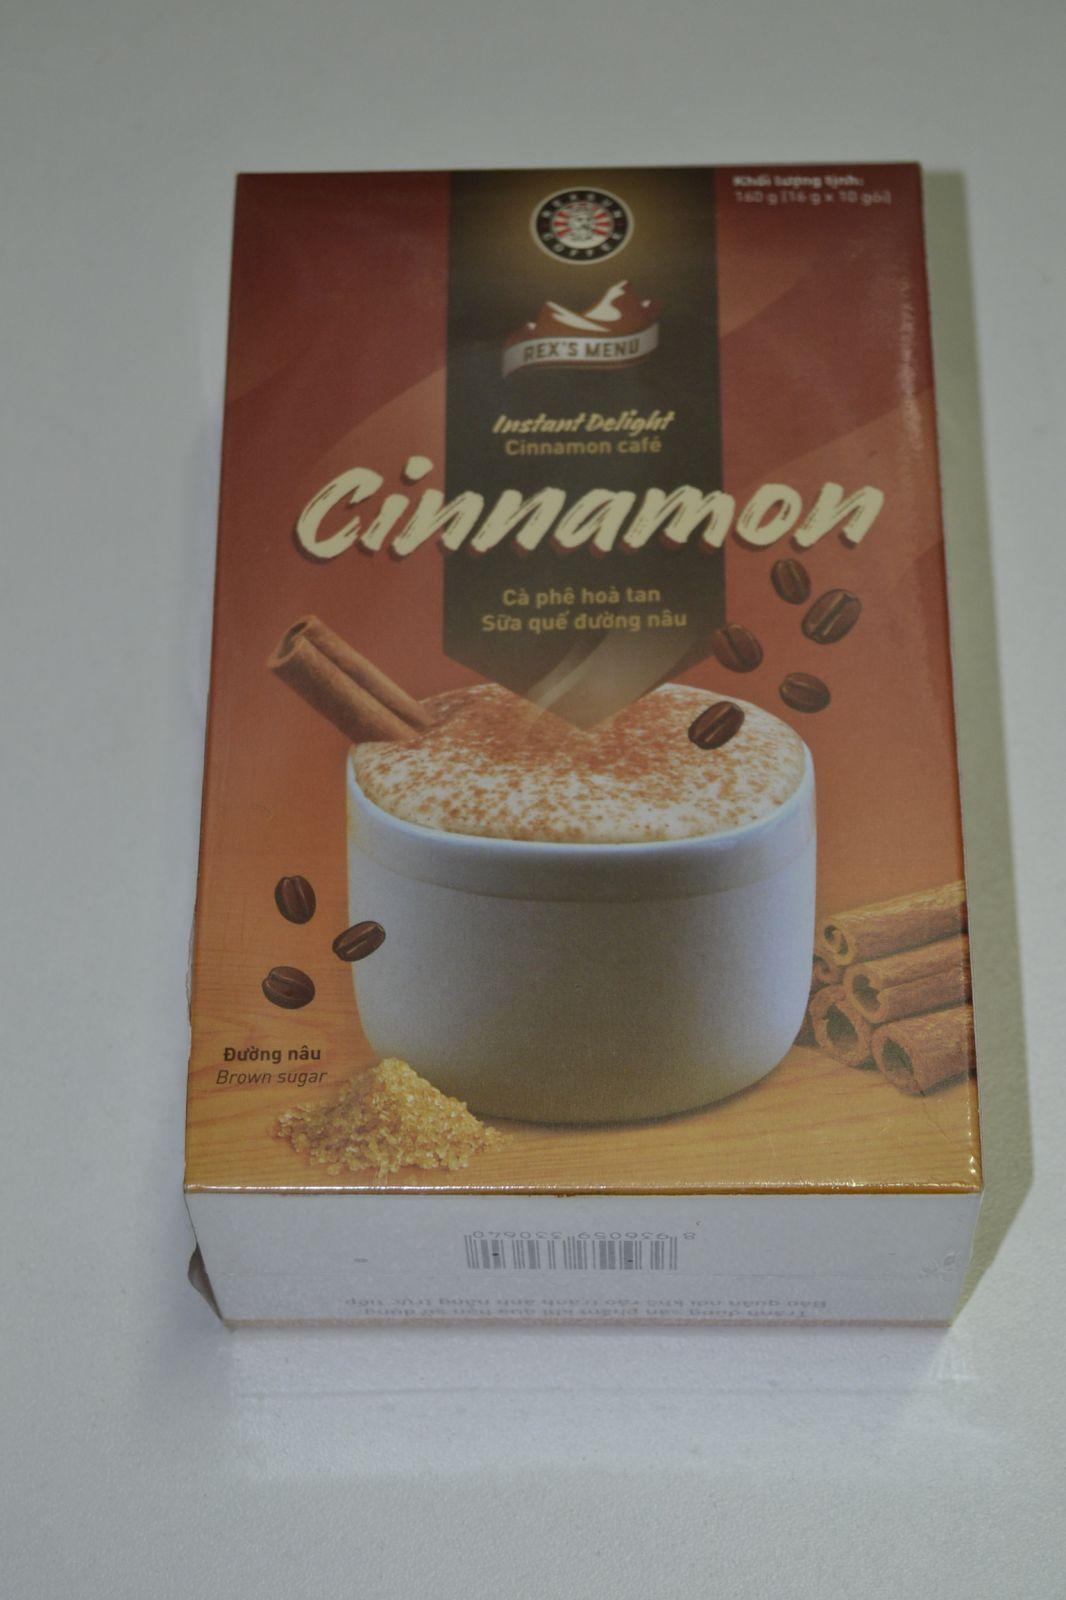 Instantní káva - Cinnamon café - Rexsun Cofee